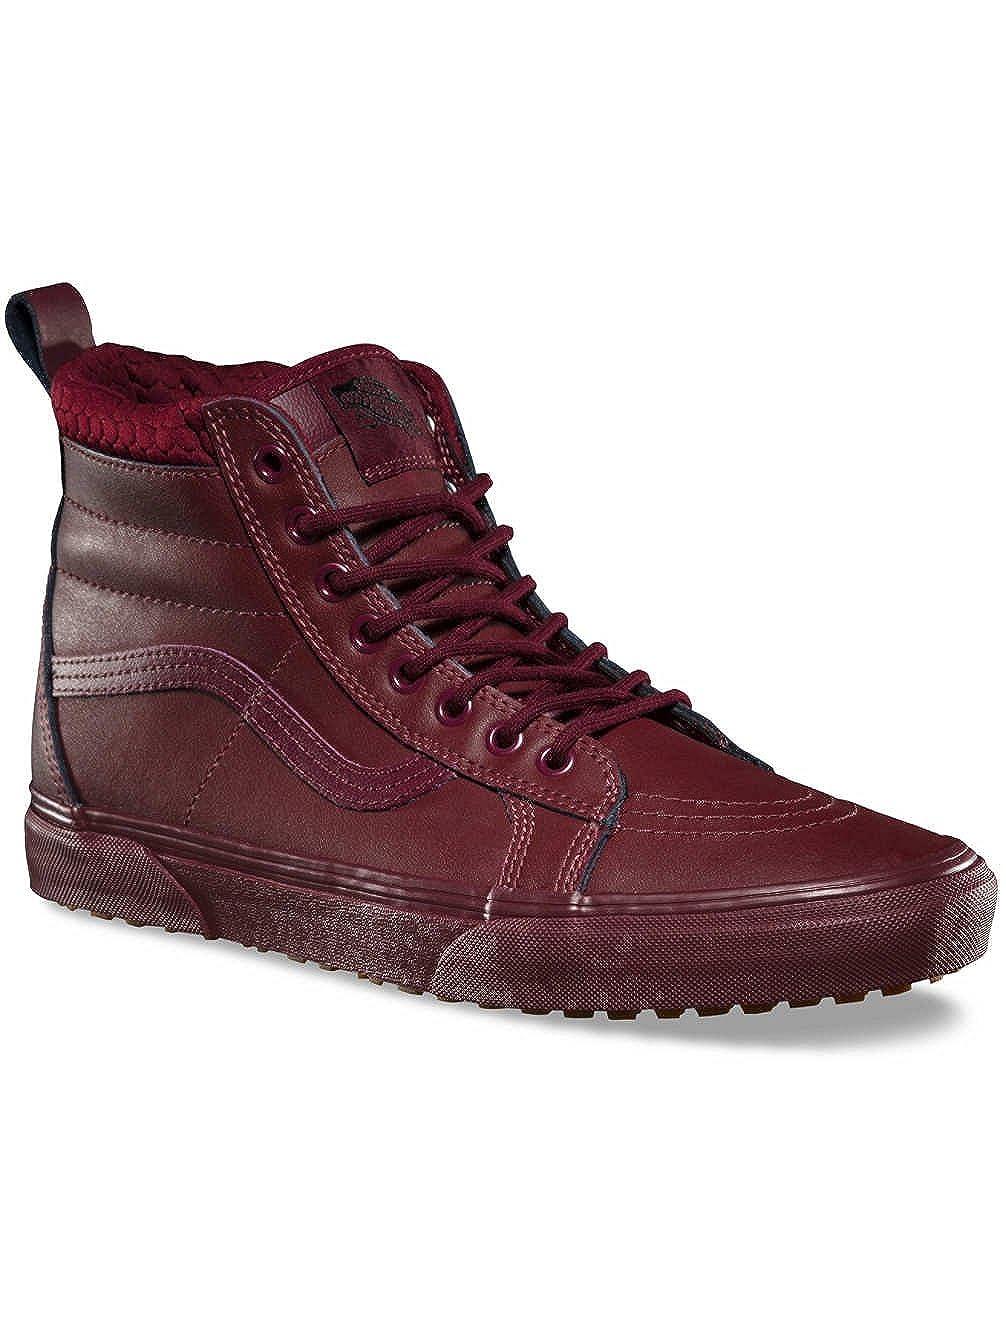 Vans Off The Wall SK8-Hi 46 MTE Sneakers (Port Royale) Leather Outdoor Shoes 9.5 M US Women / 8 M US Men